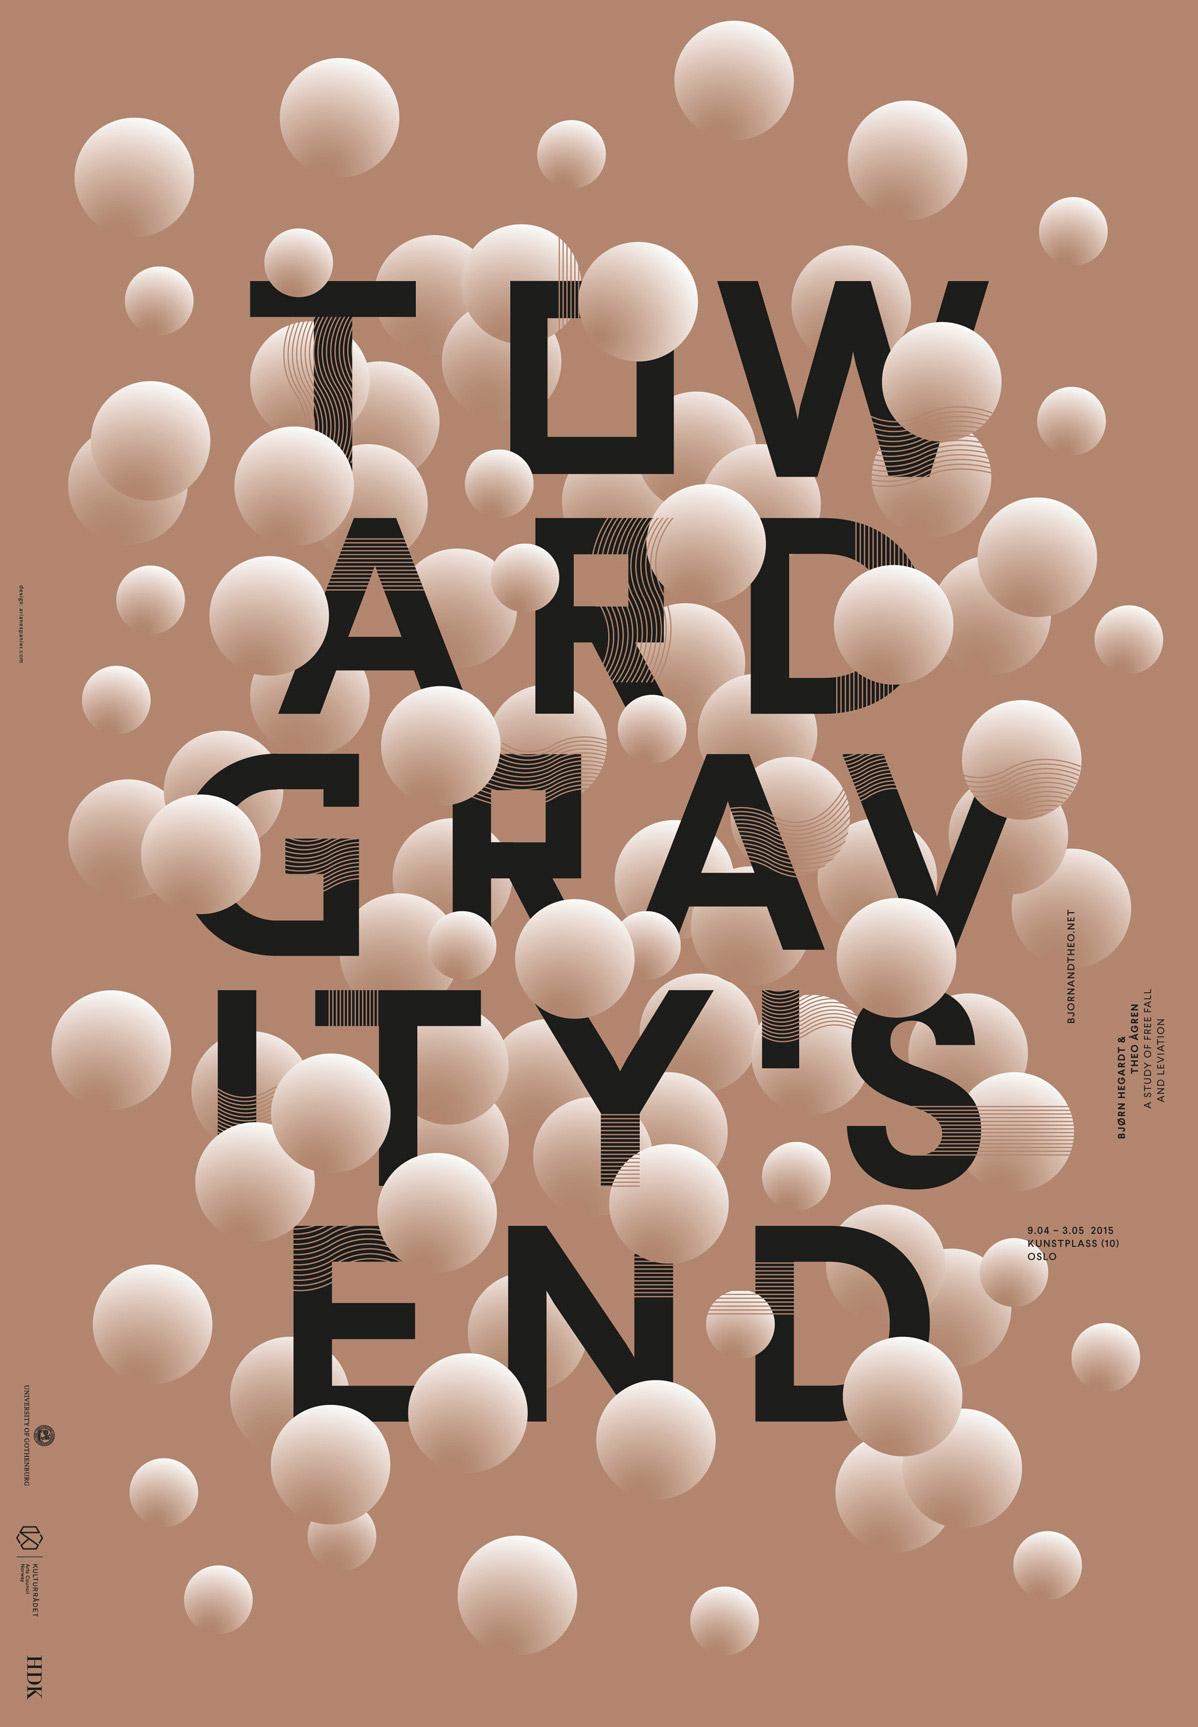 posters — Ariane Spanier Design